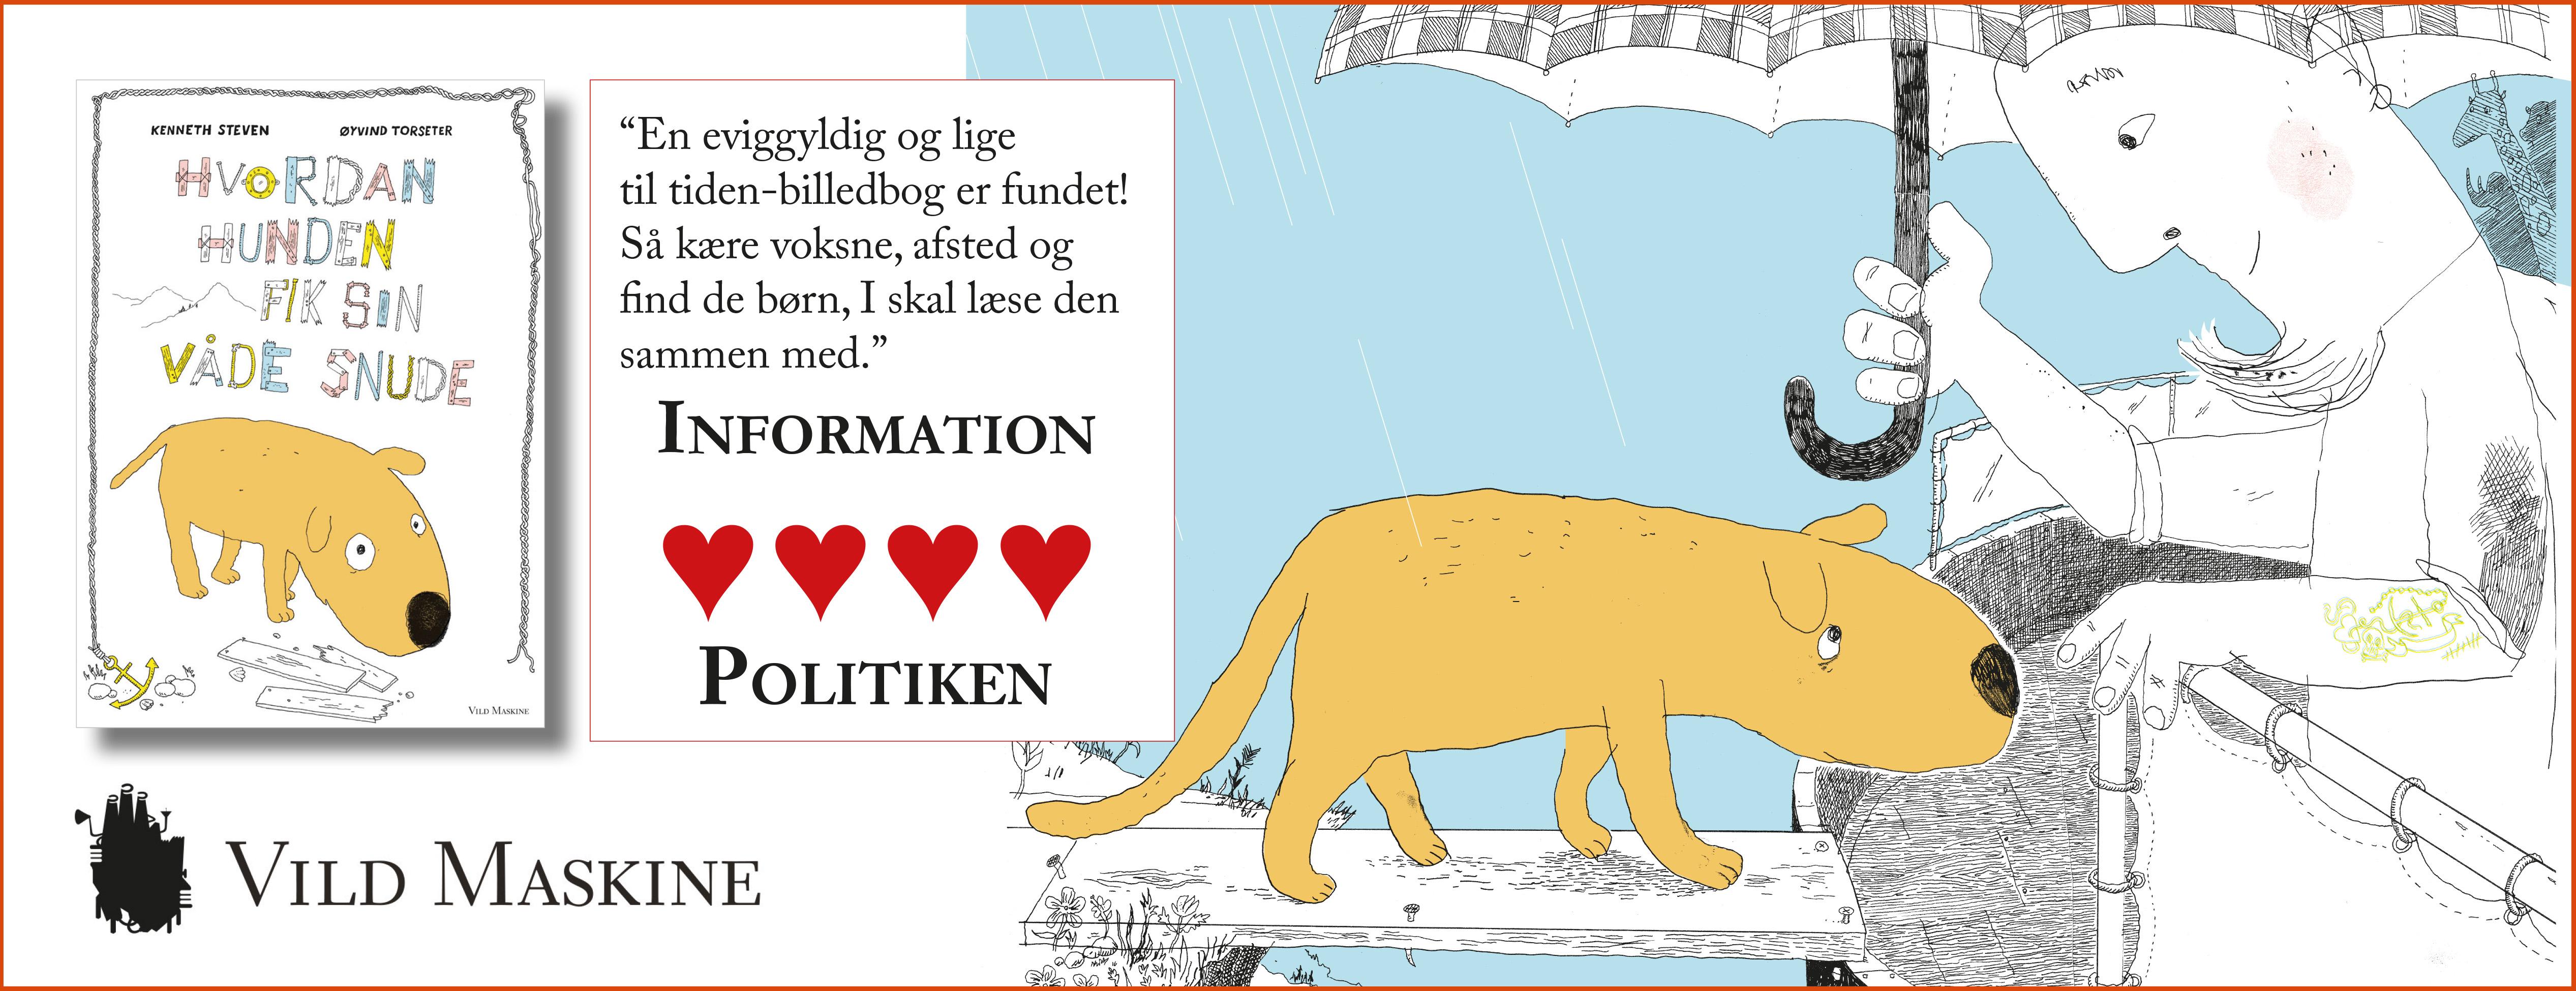 HUNDEN facebook-banner